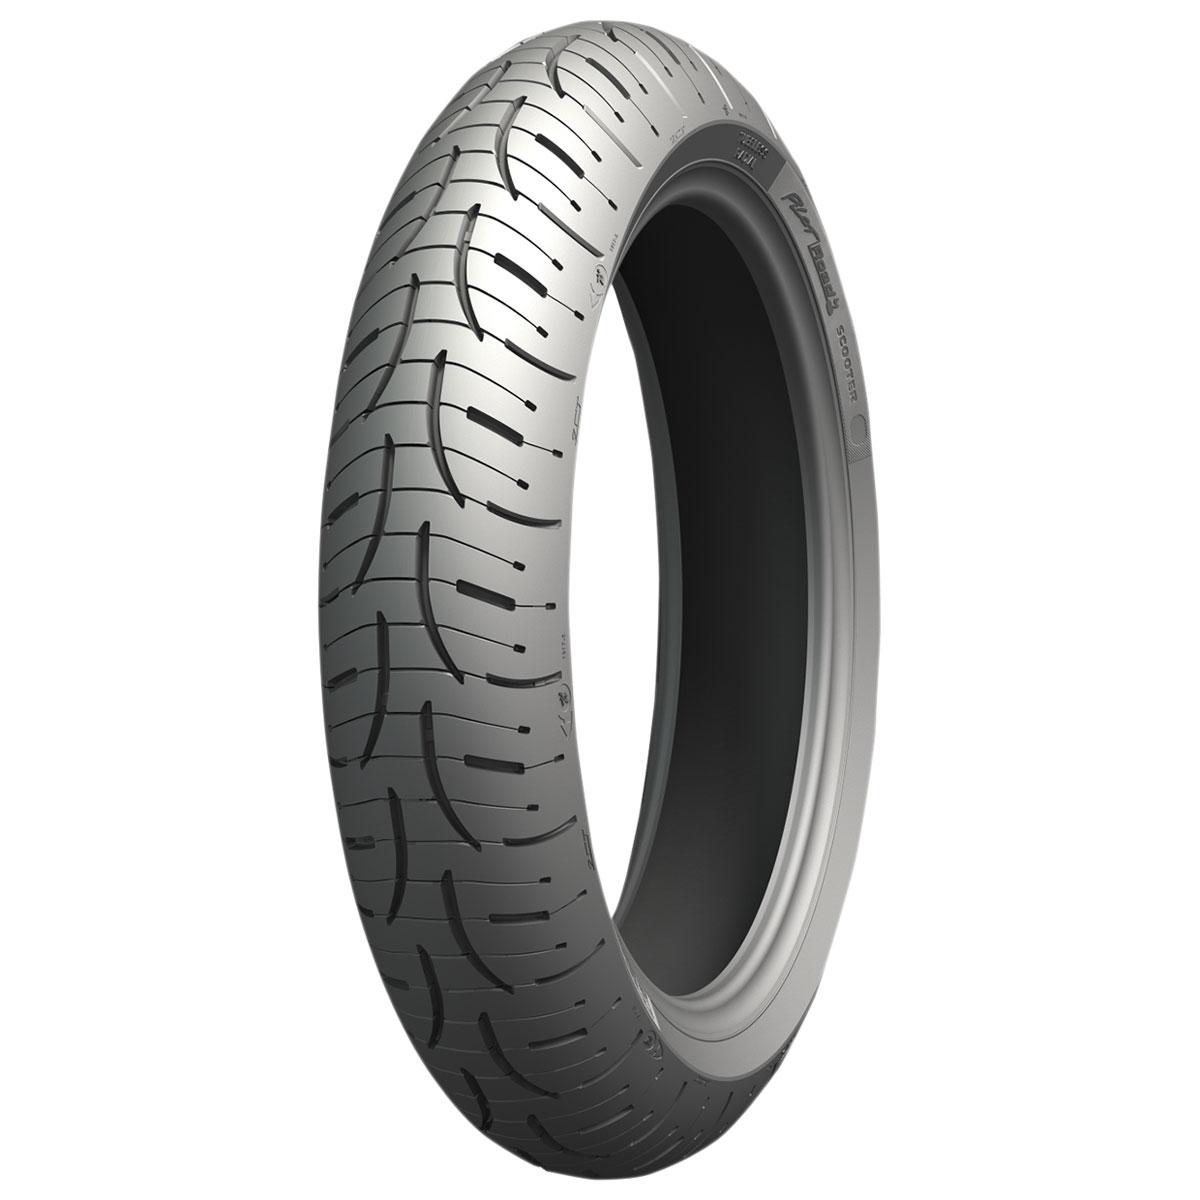 Michelin Pilot Road 4 120/70R15 Front Tire